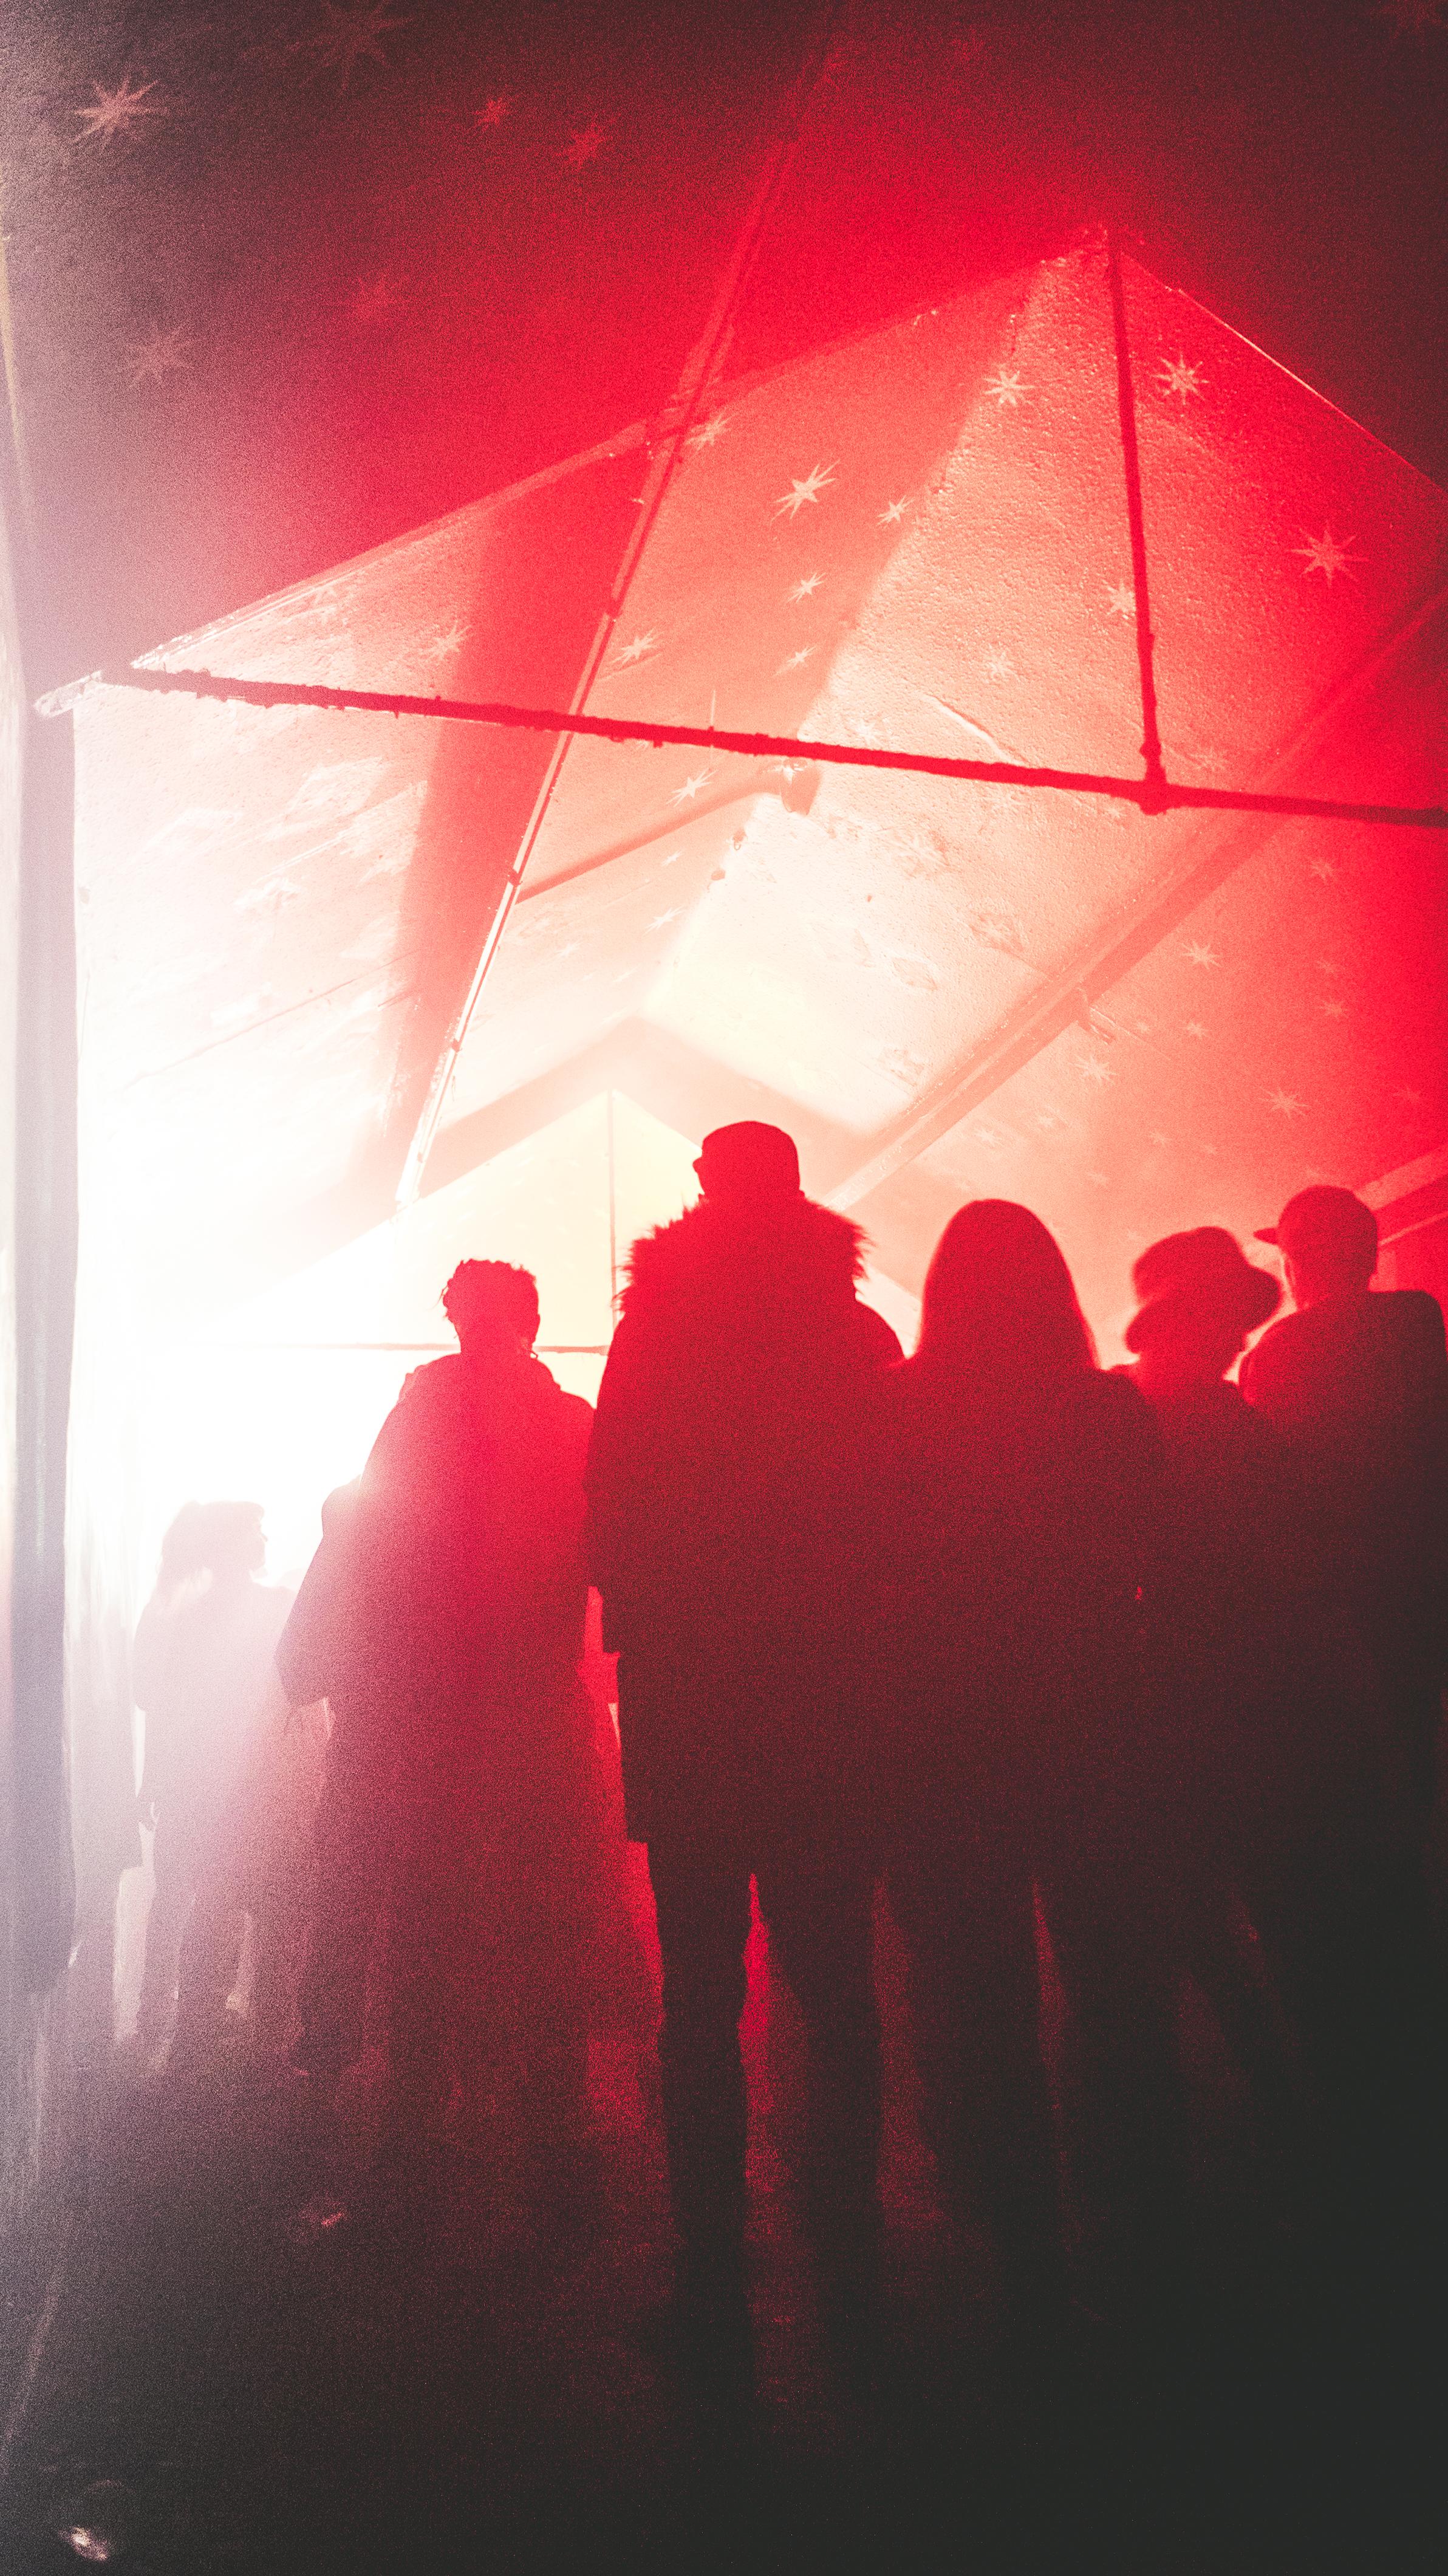 CNCPT Collective at the Black Swan, Bristol. Photo by Callum Chaplin